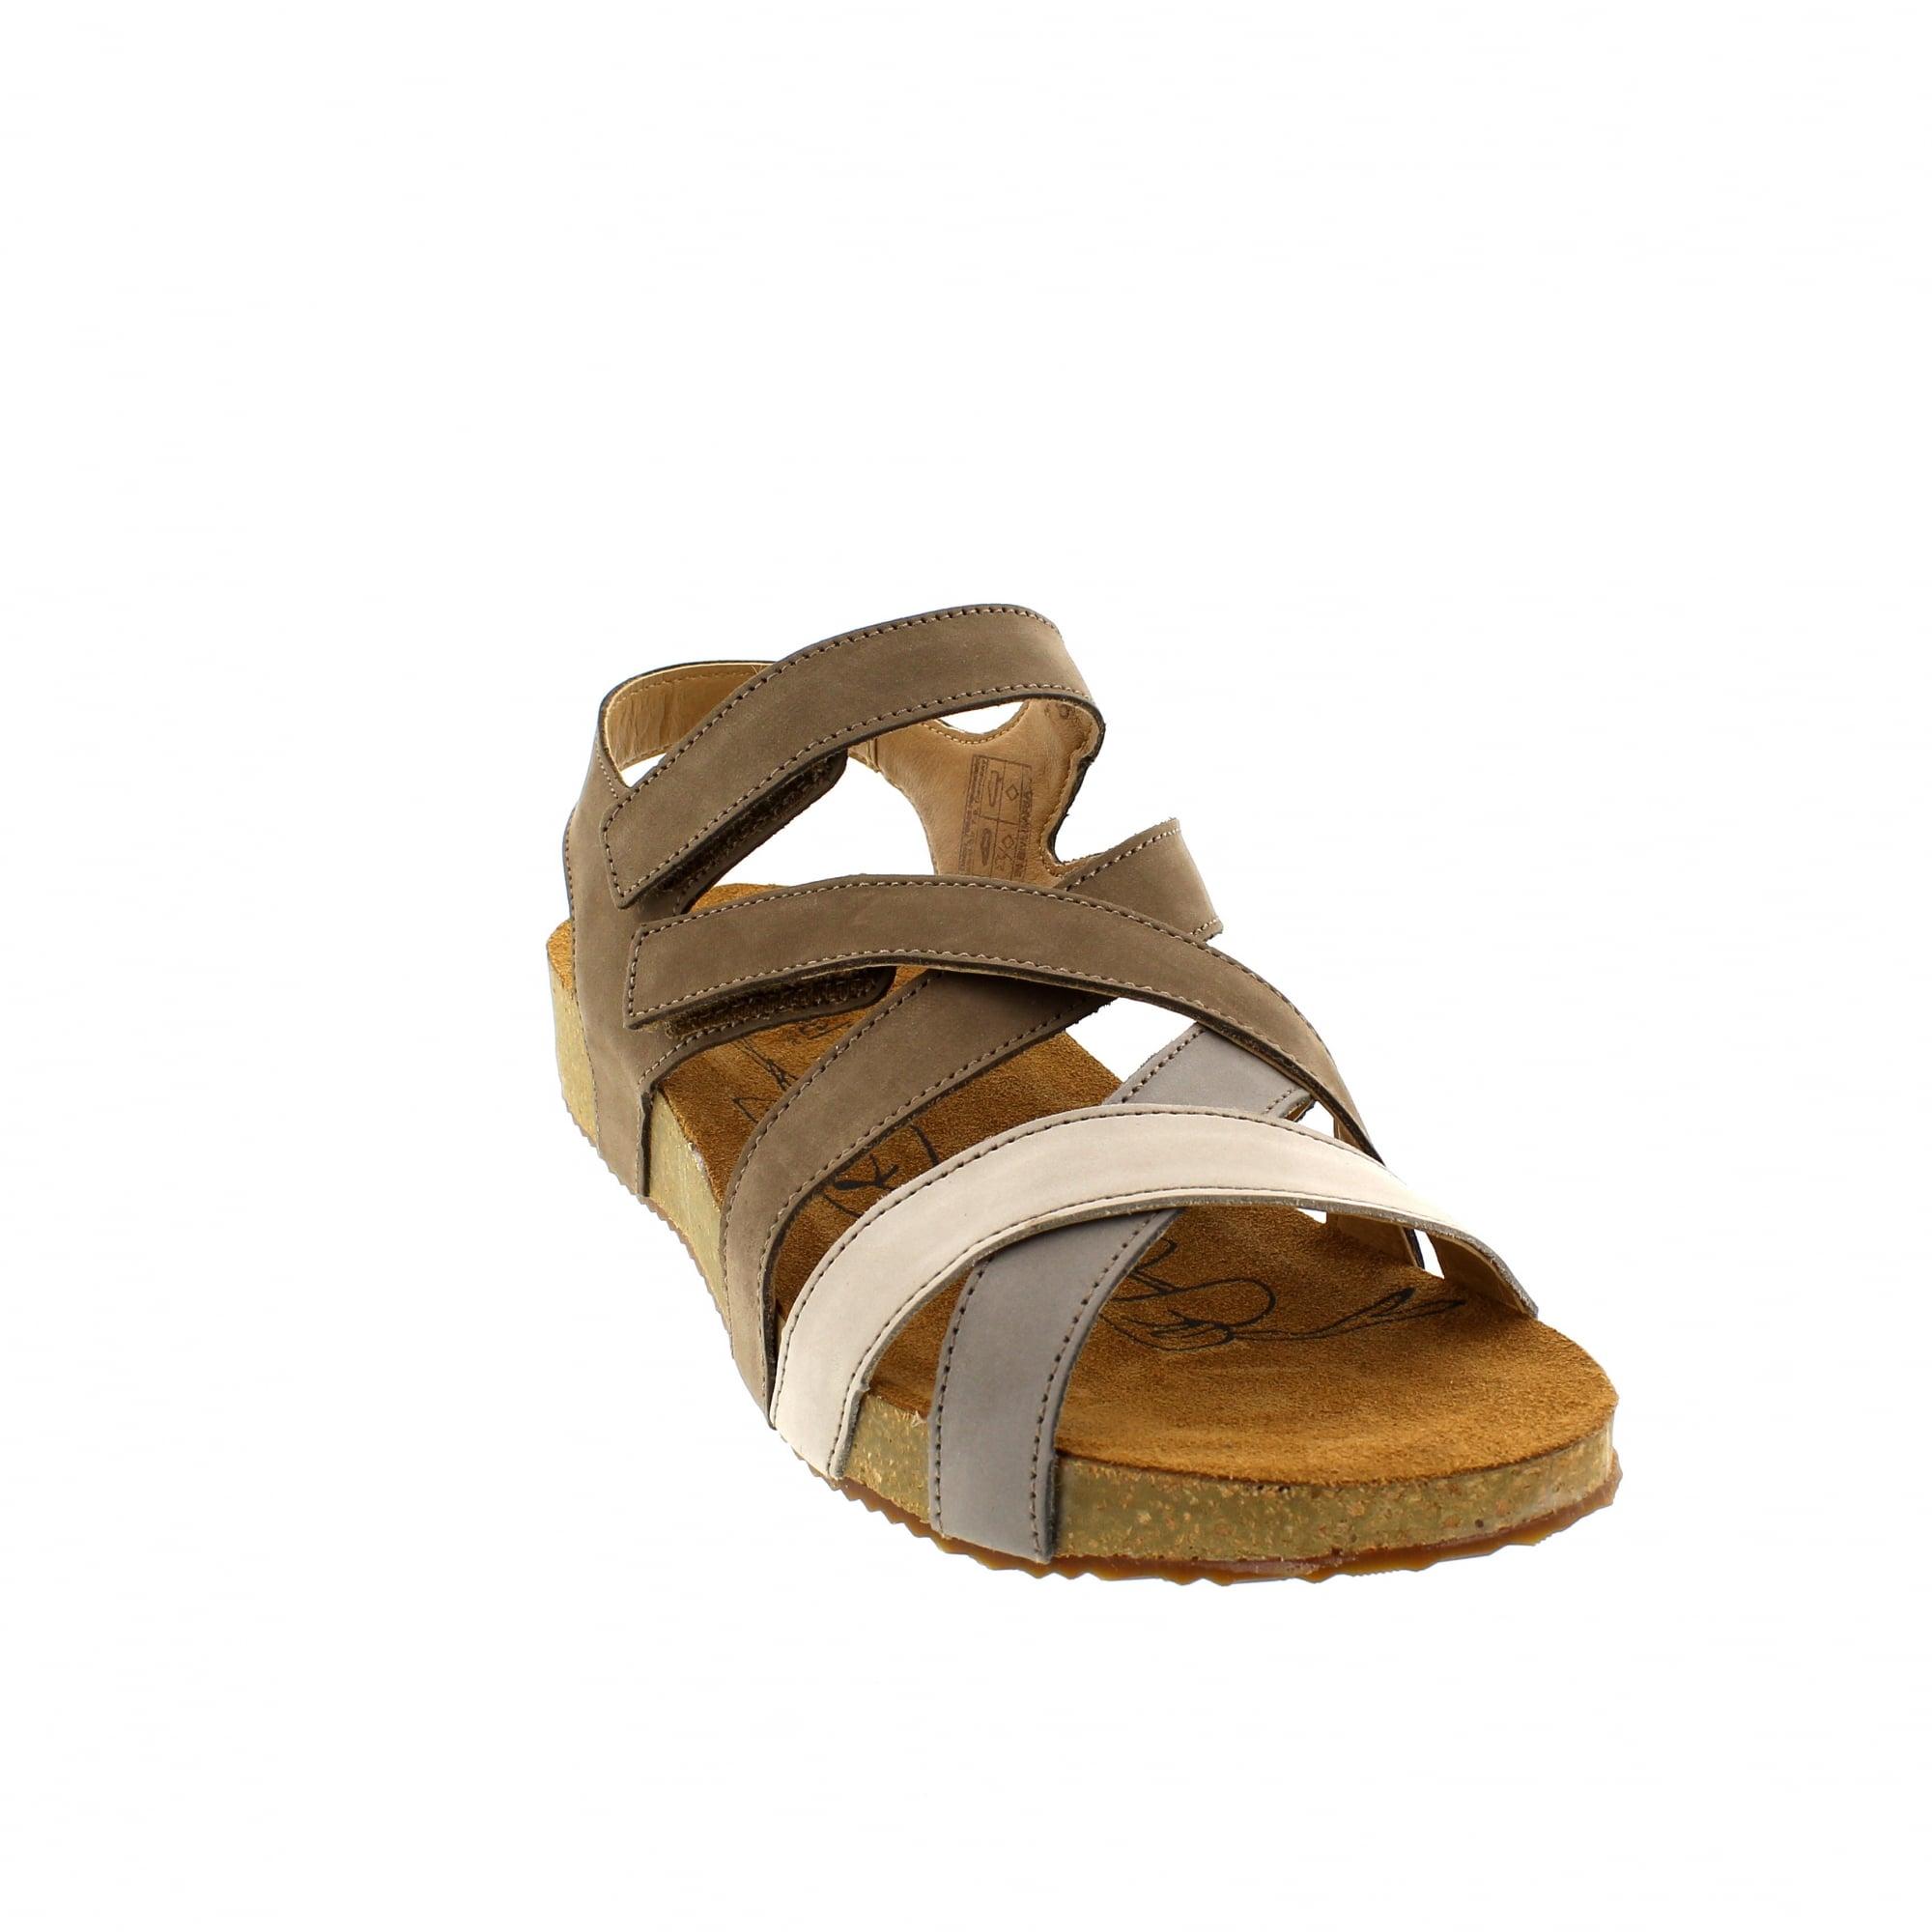 34de84a9086f Josef Seibel Tonga 37 78537-724250 Taupe Womens Sandals